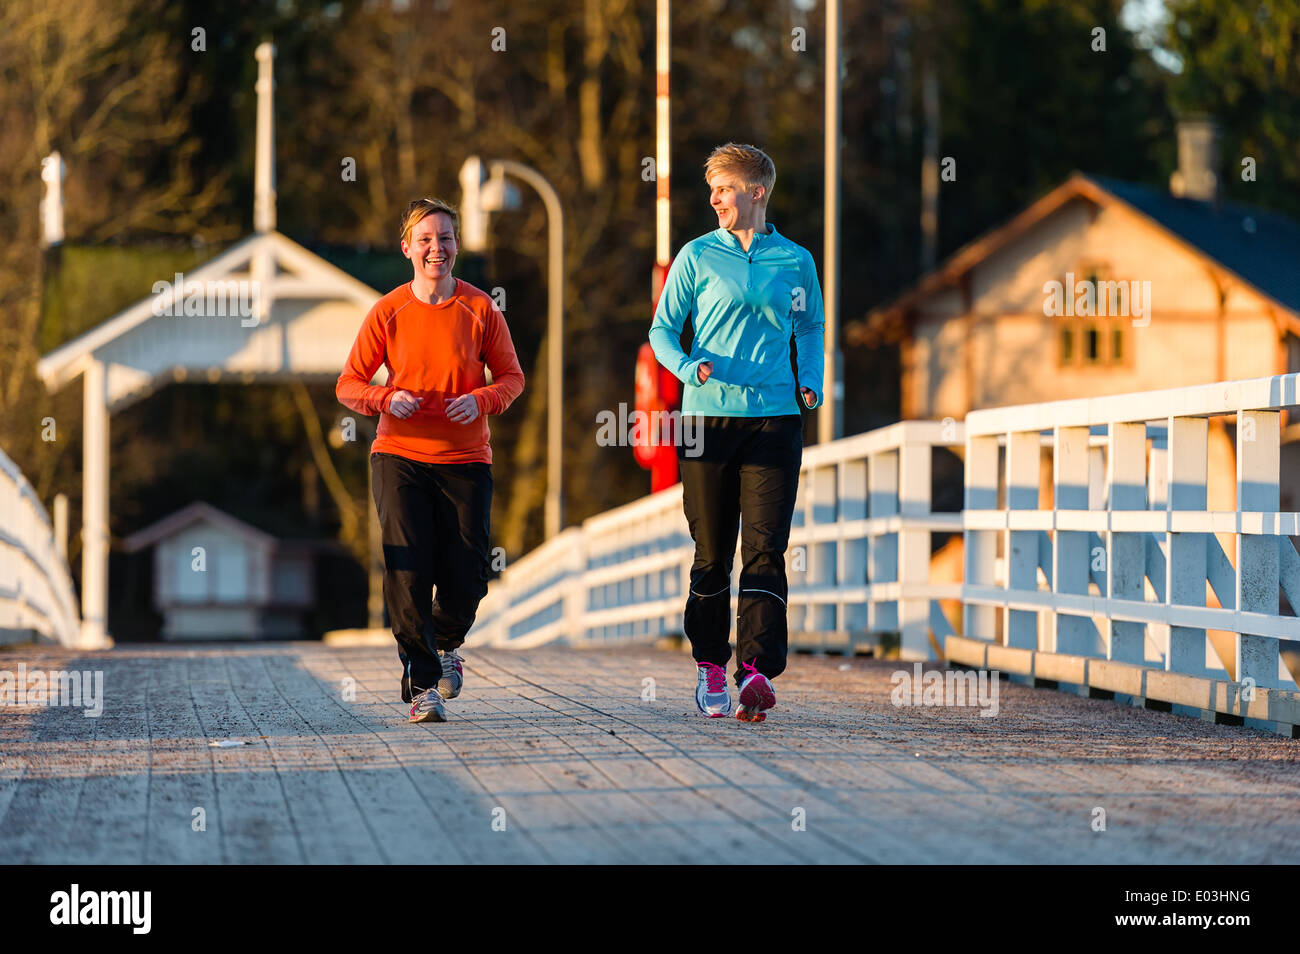 Two women jogging together along the bridge at sunrise - Stock Image